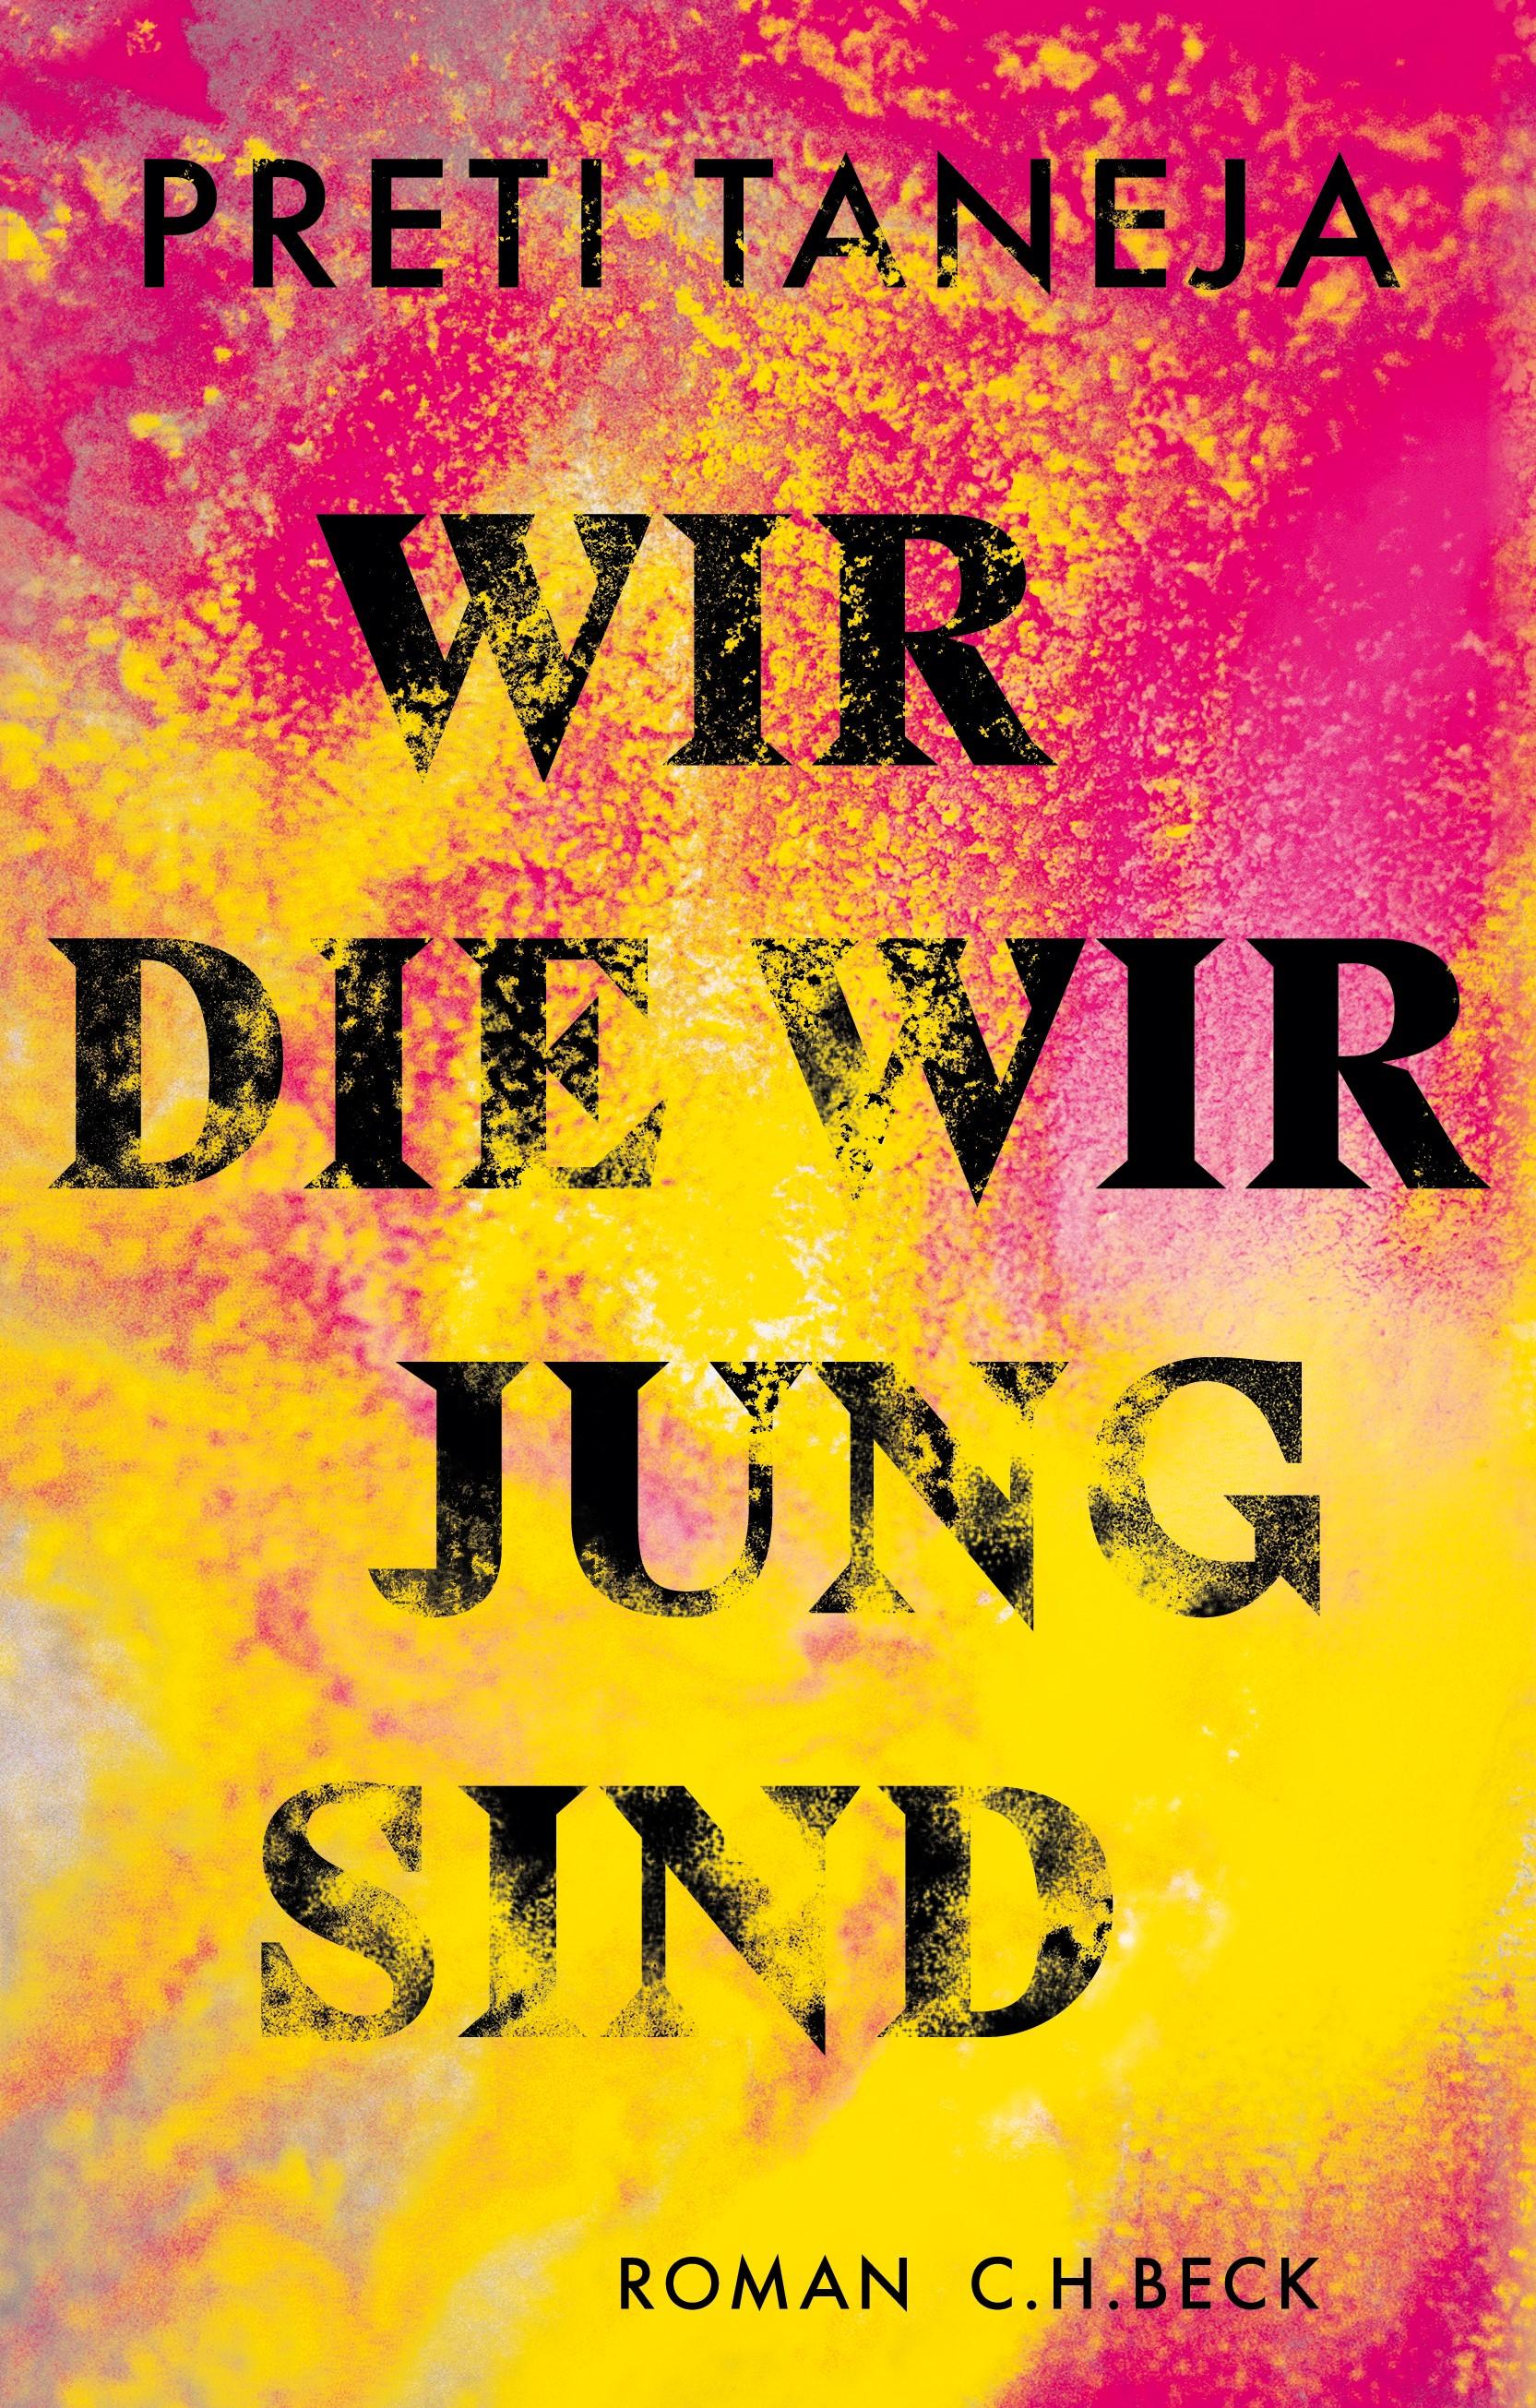 Wir, die wir jung sind | Taneja, Preti, 2019 | Buch (Cover)